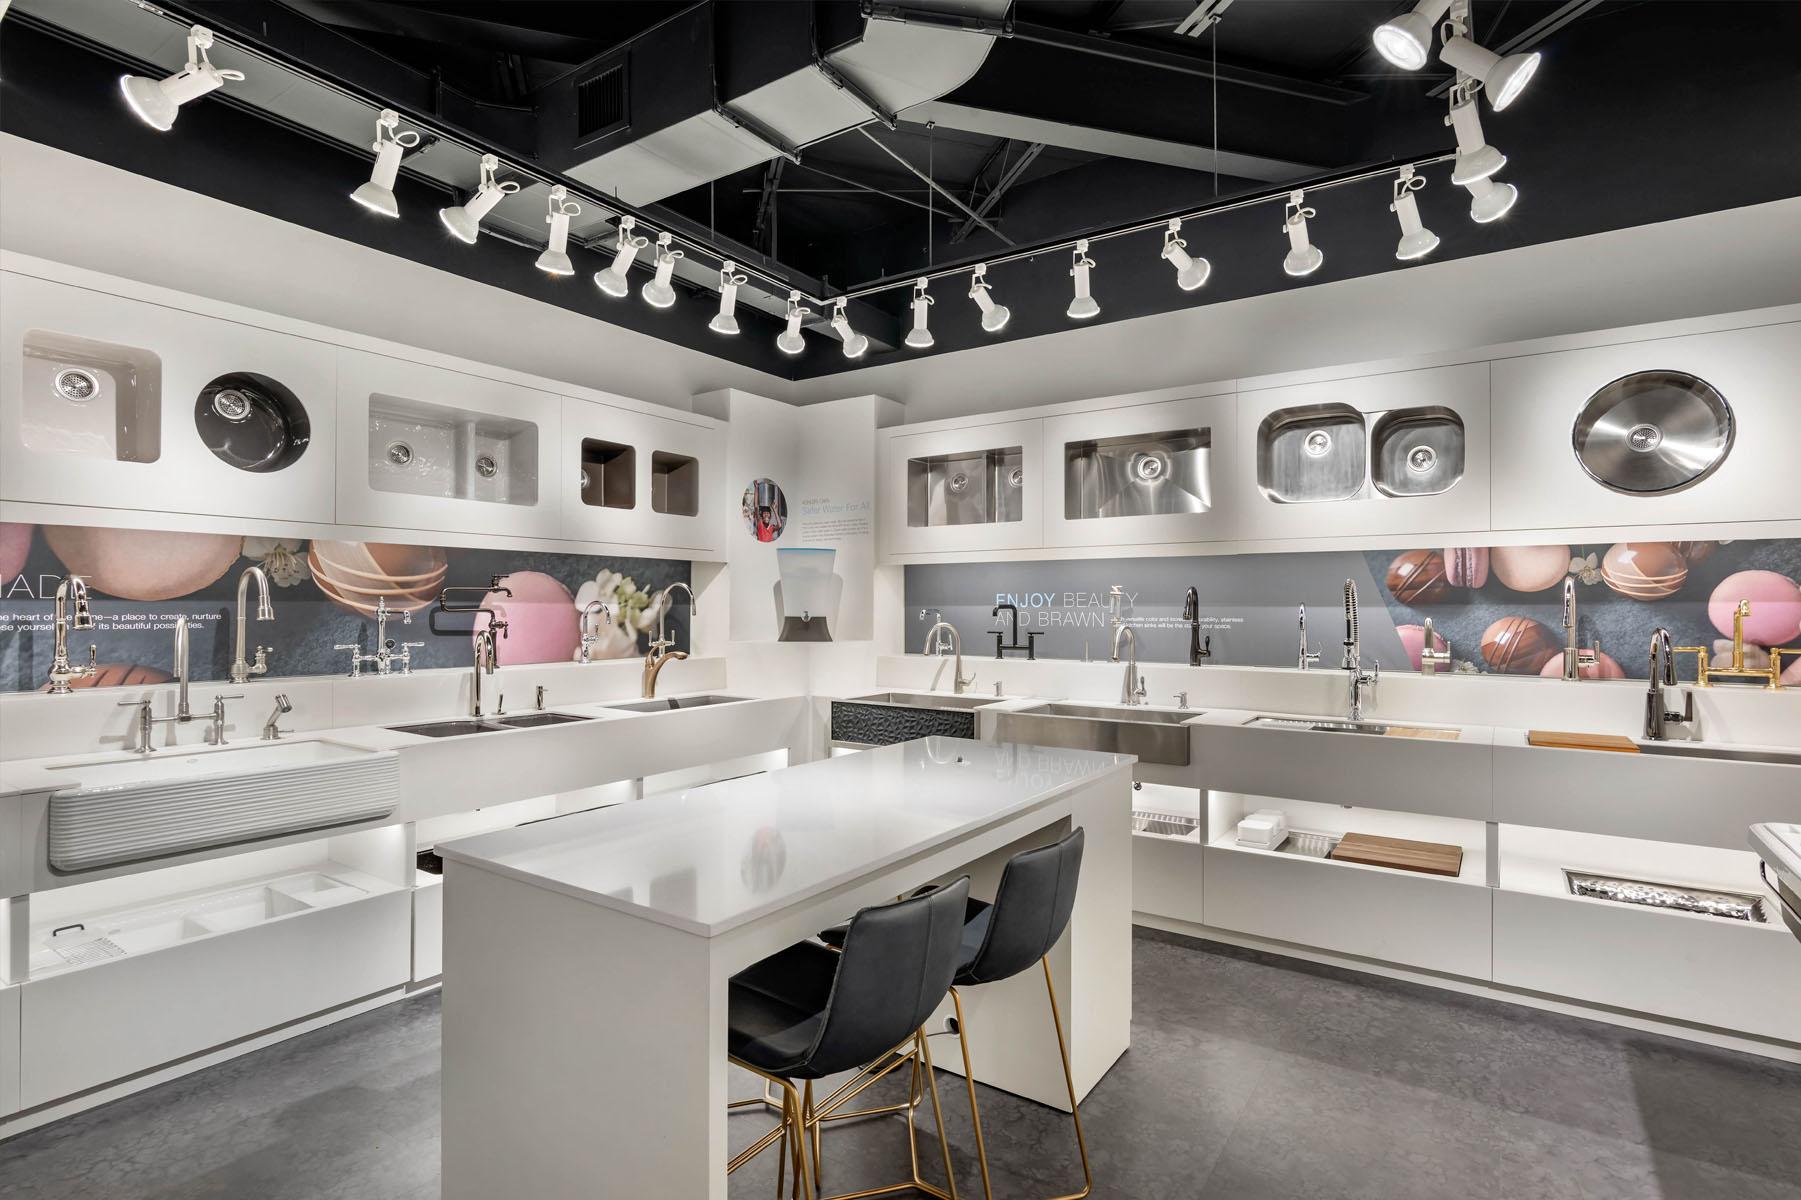 kohler showroom sinks faucets